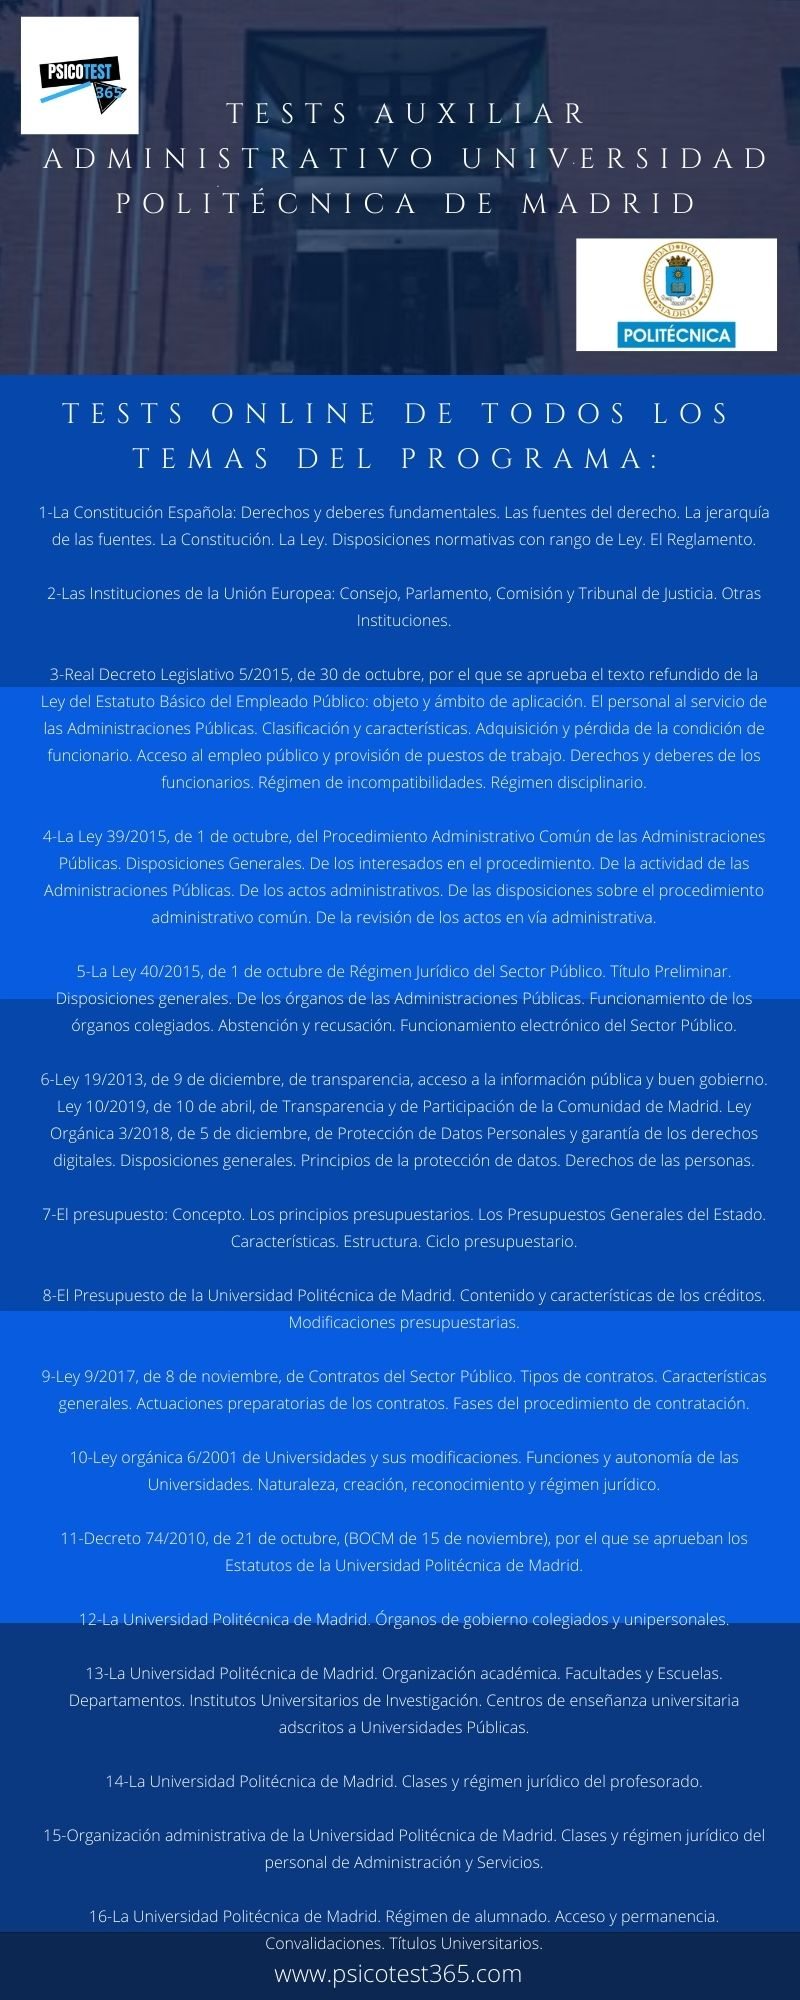 infografia tests auxiliares administrativos politécnica